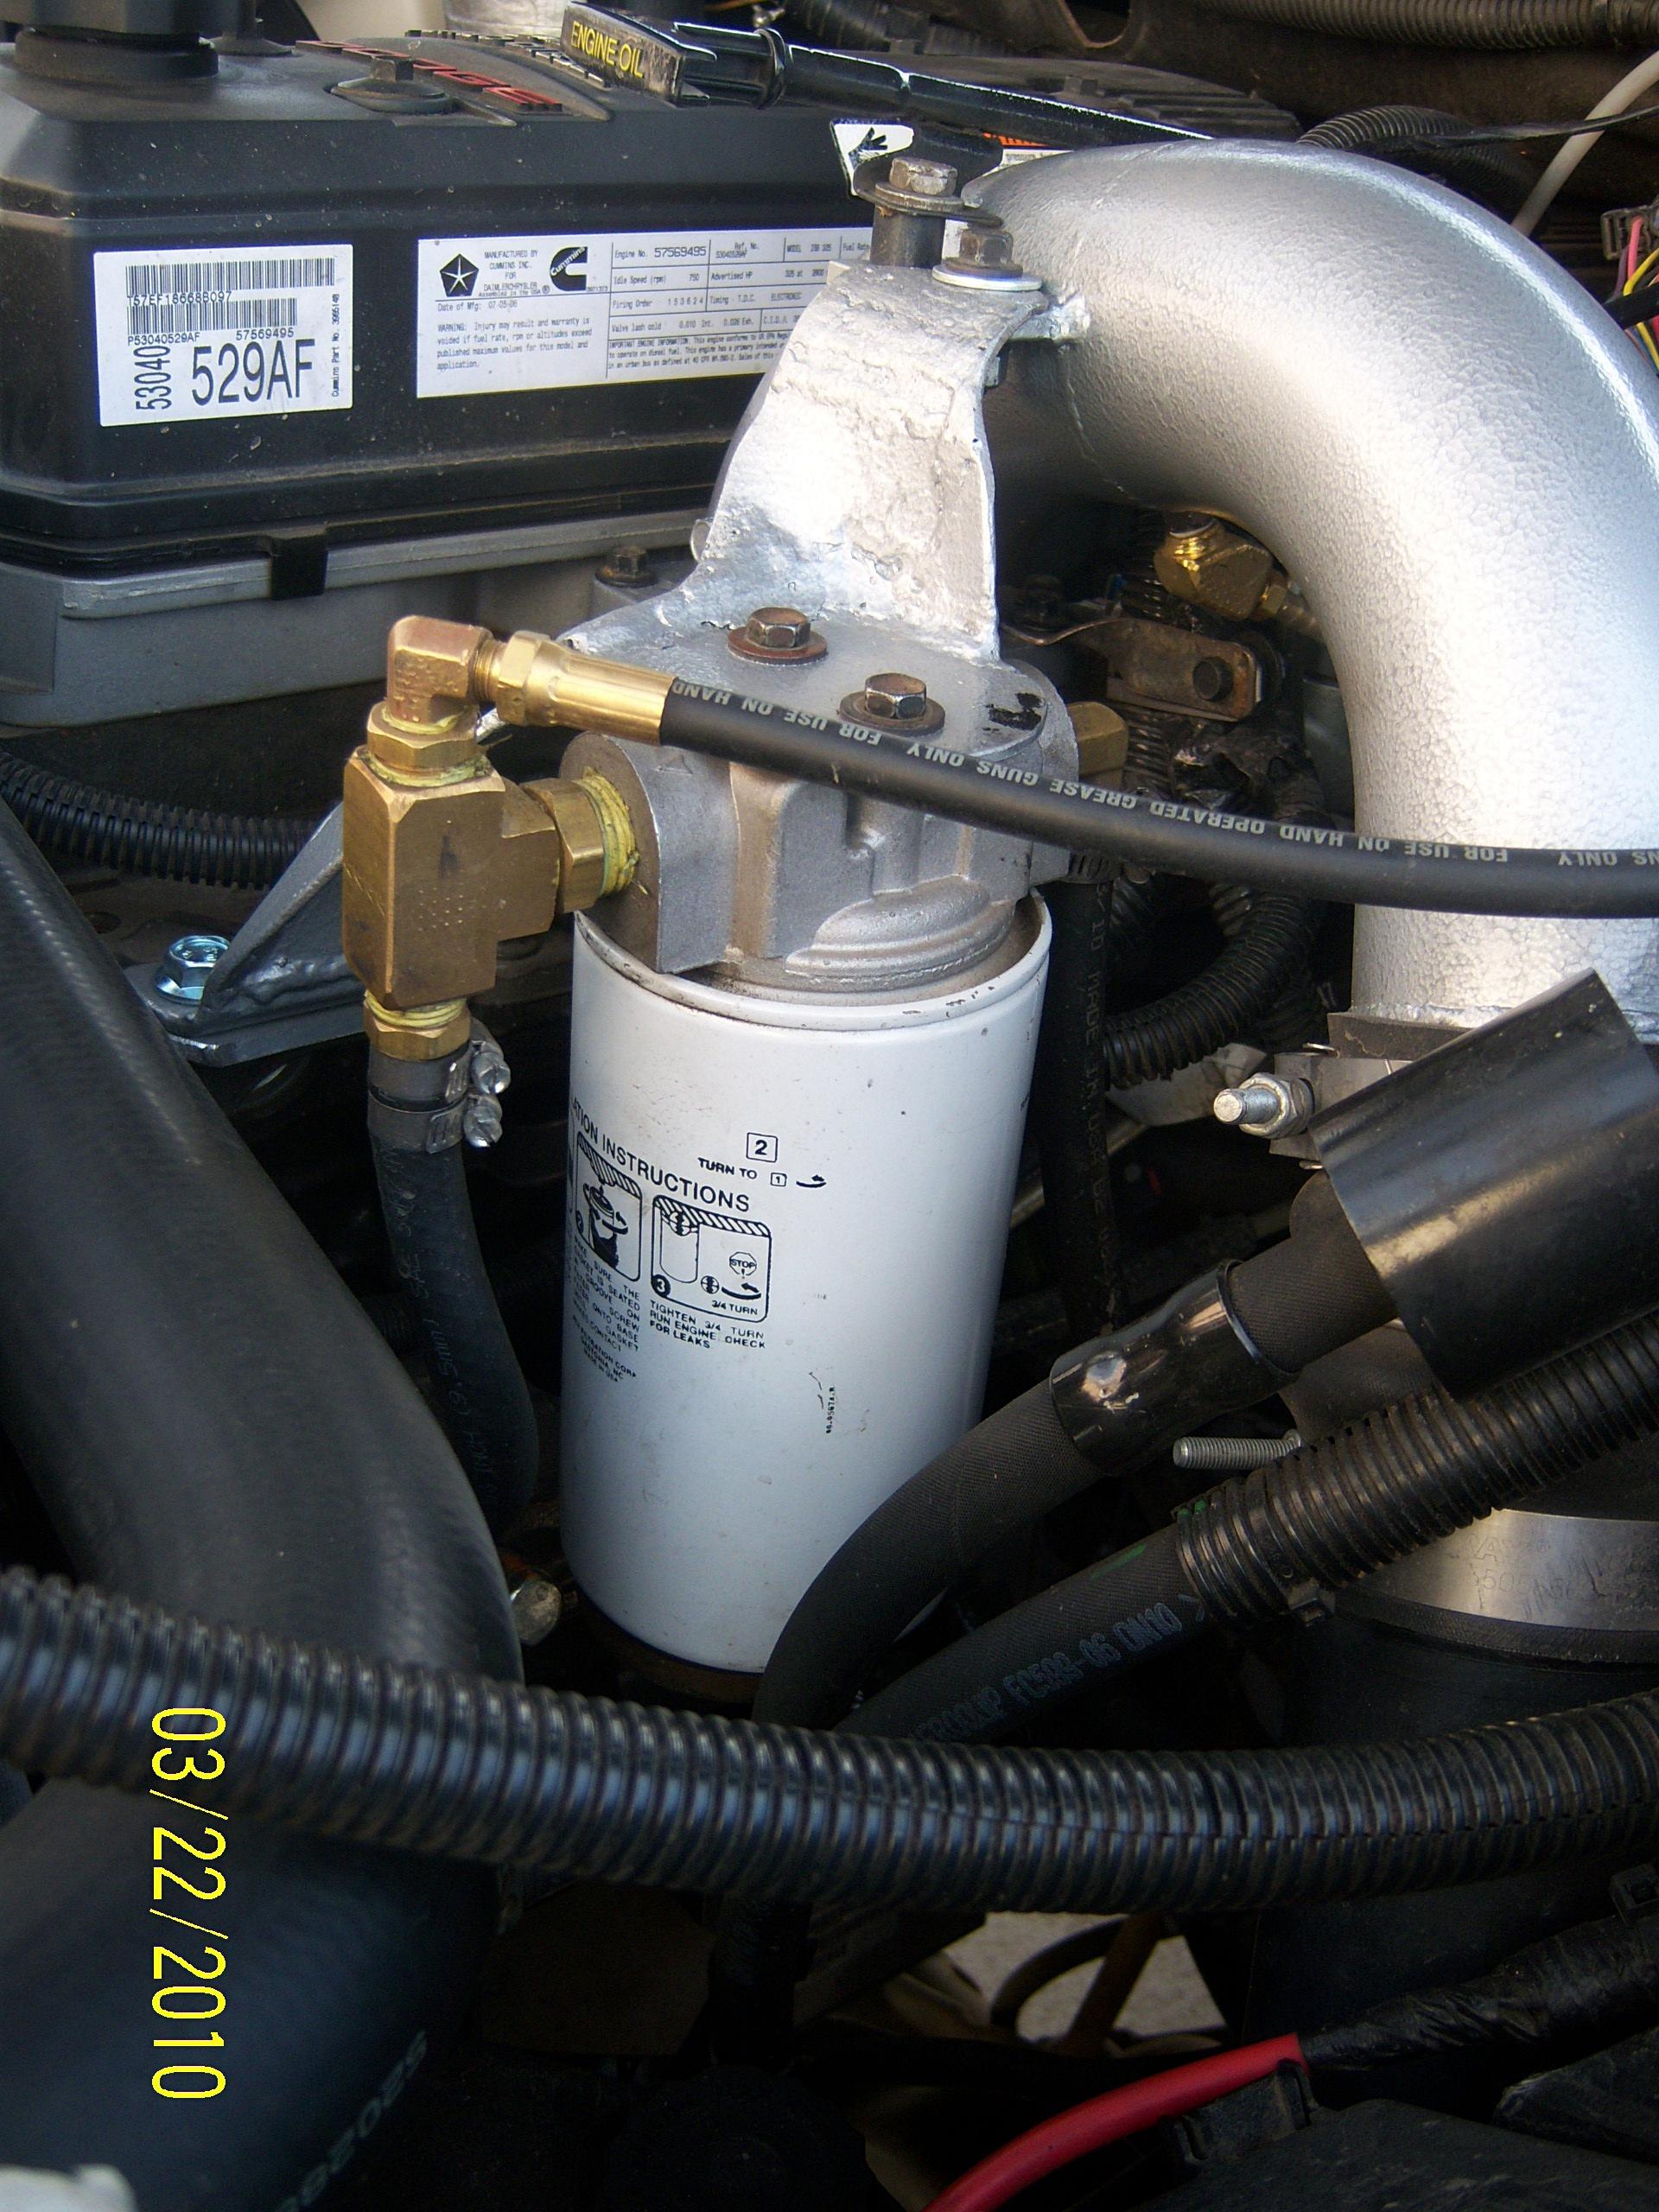 Want to build a 2 micron fuel filter setup....part # please - Dodge